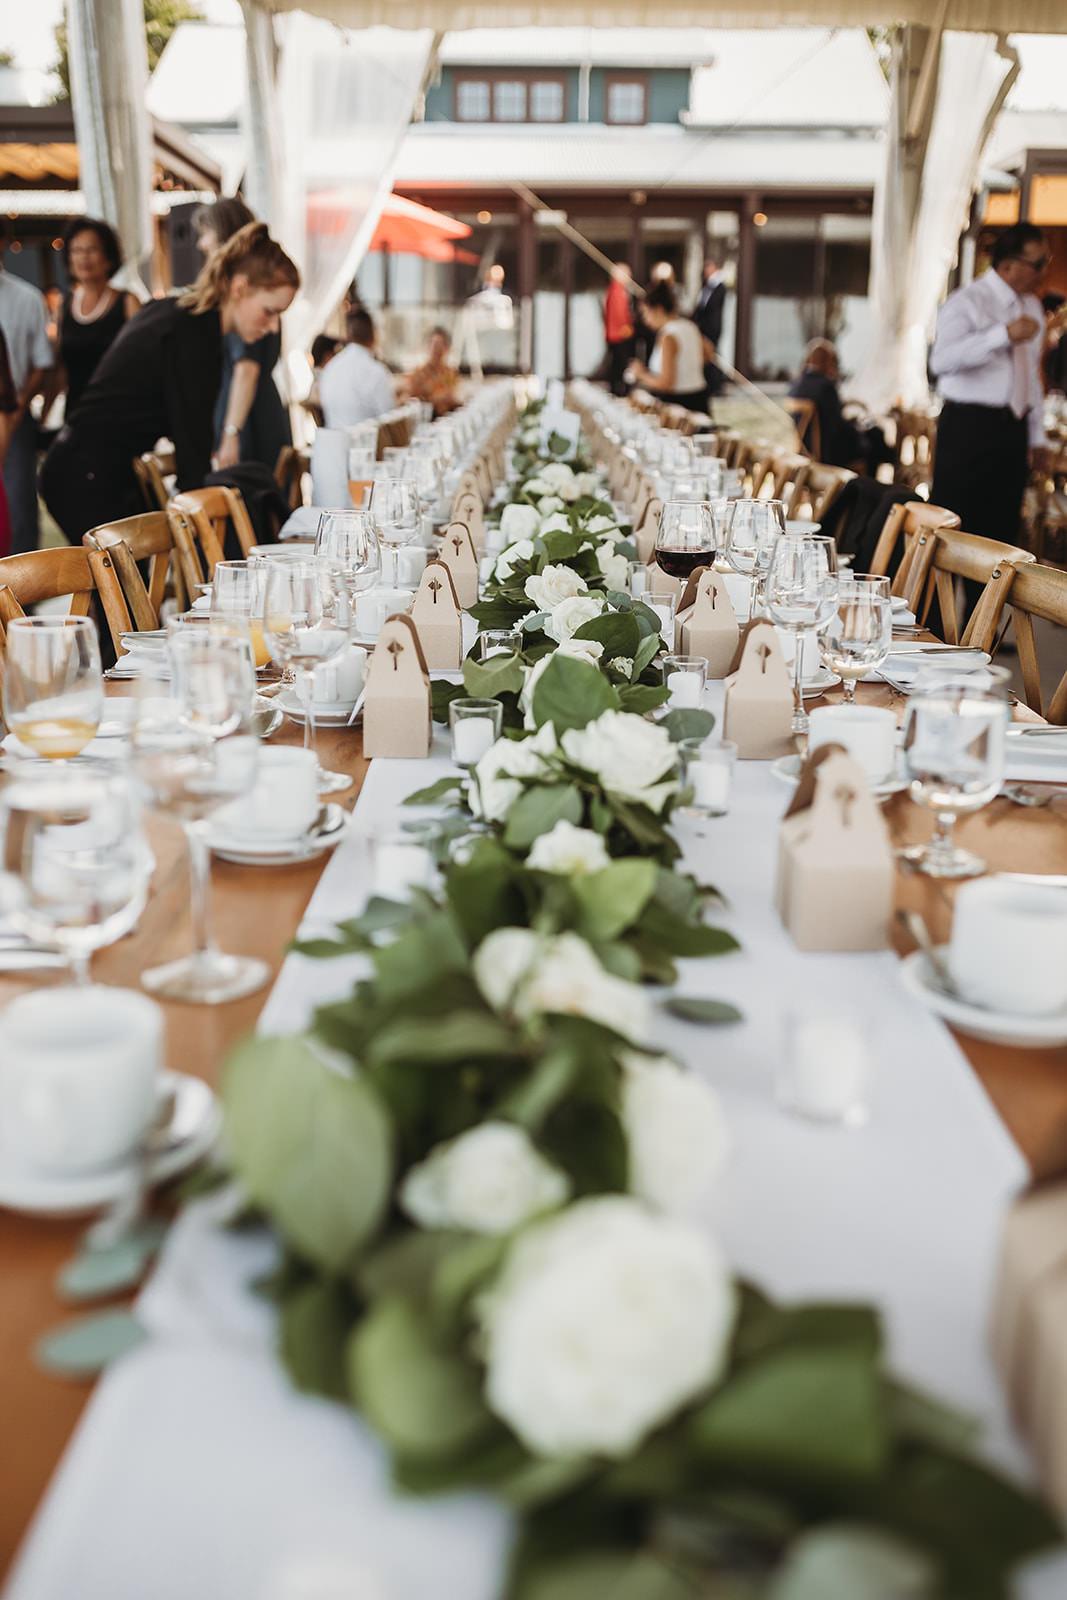 Vineyard Wedding Outdoor Reception Farm Tables Floral Chandelier Tent